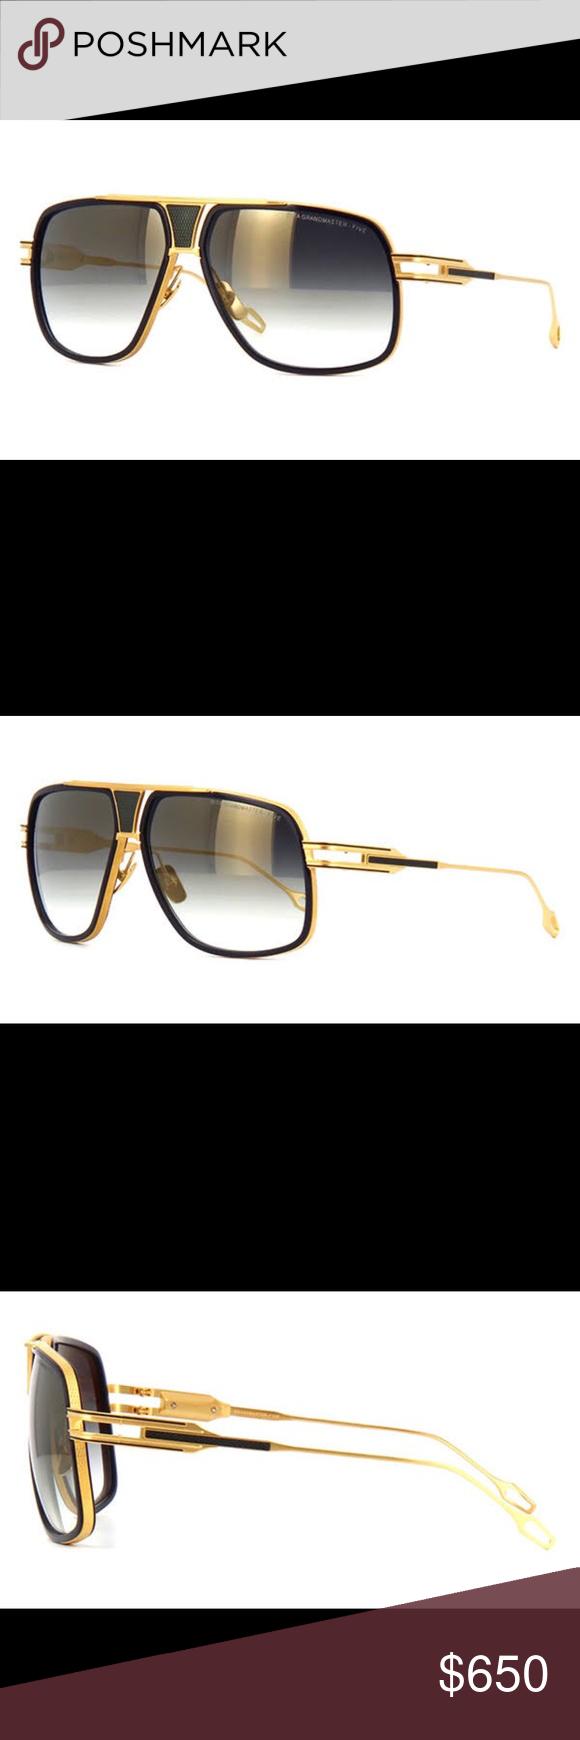 aed4251be7 Dita Grandmaster Five Sunglasses Dita Grandmaster Five Sunglasses Color DRX- 2077-B Navy - 18K Gold w  D DITA Accessories Sunglasses